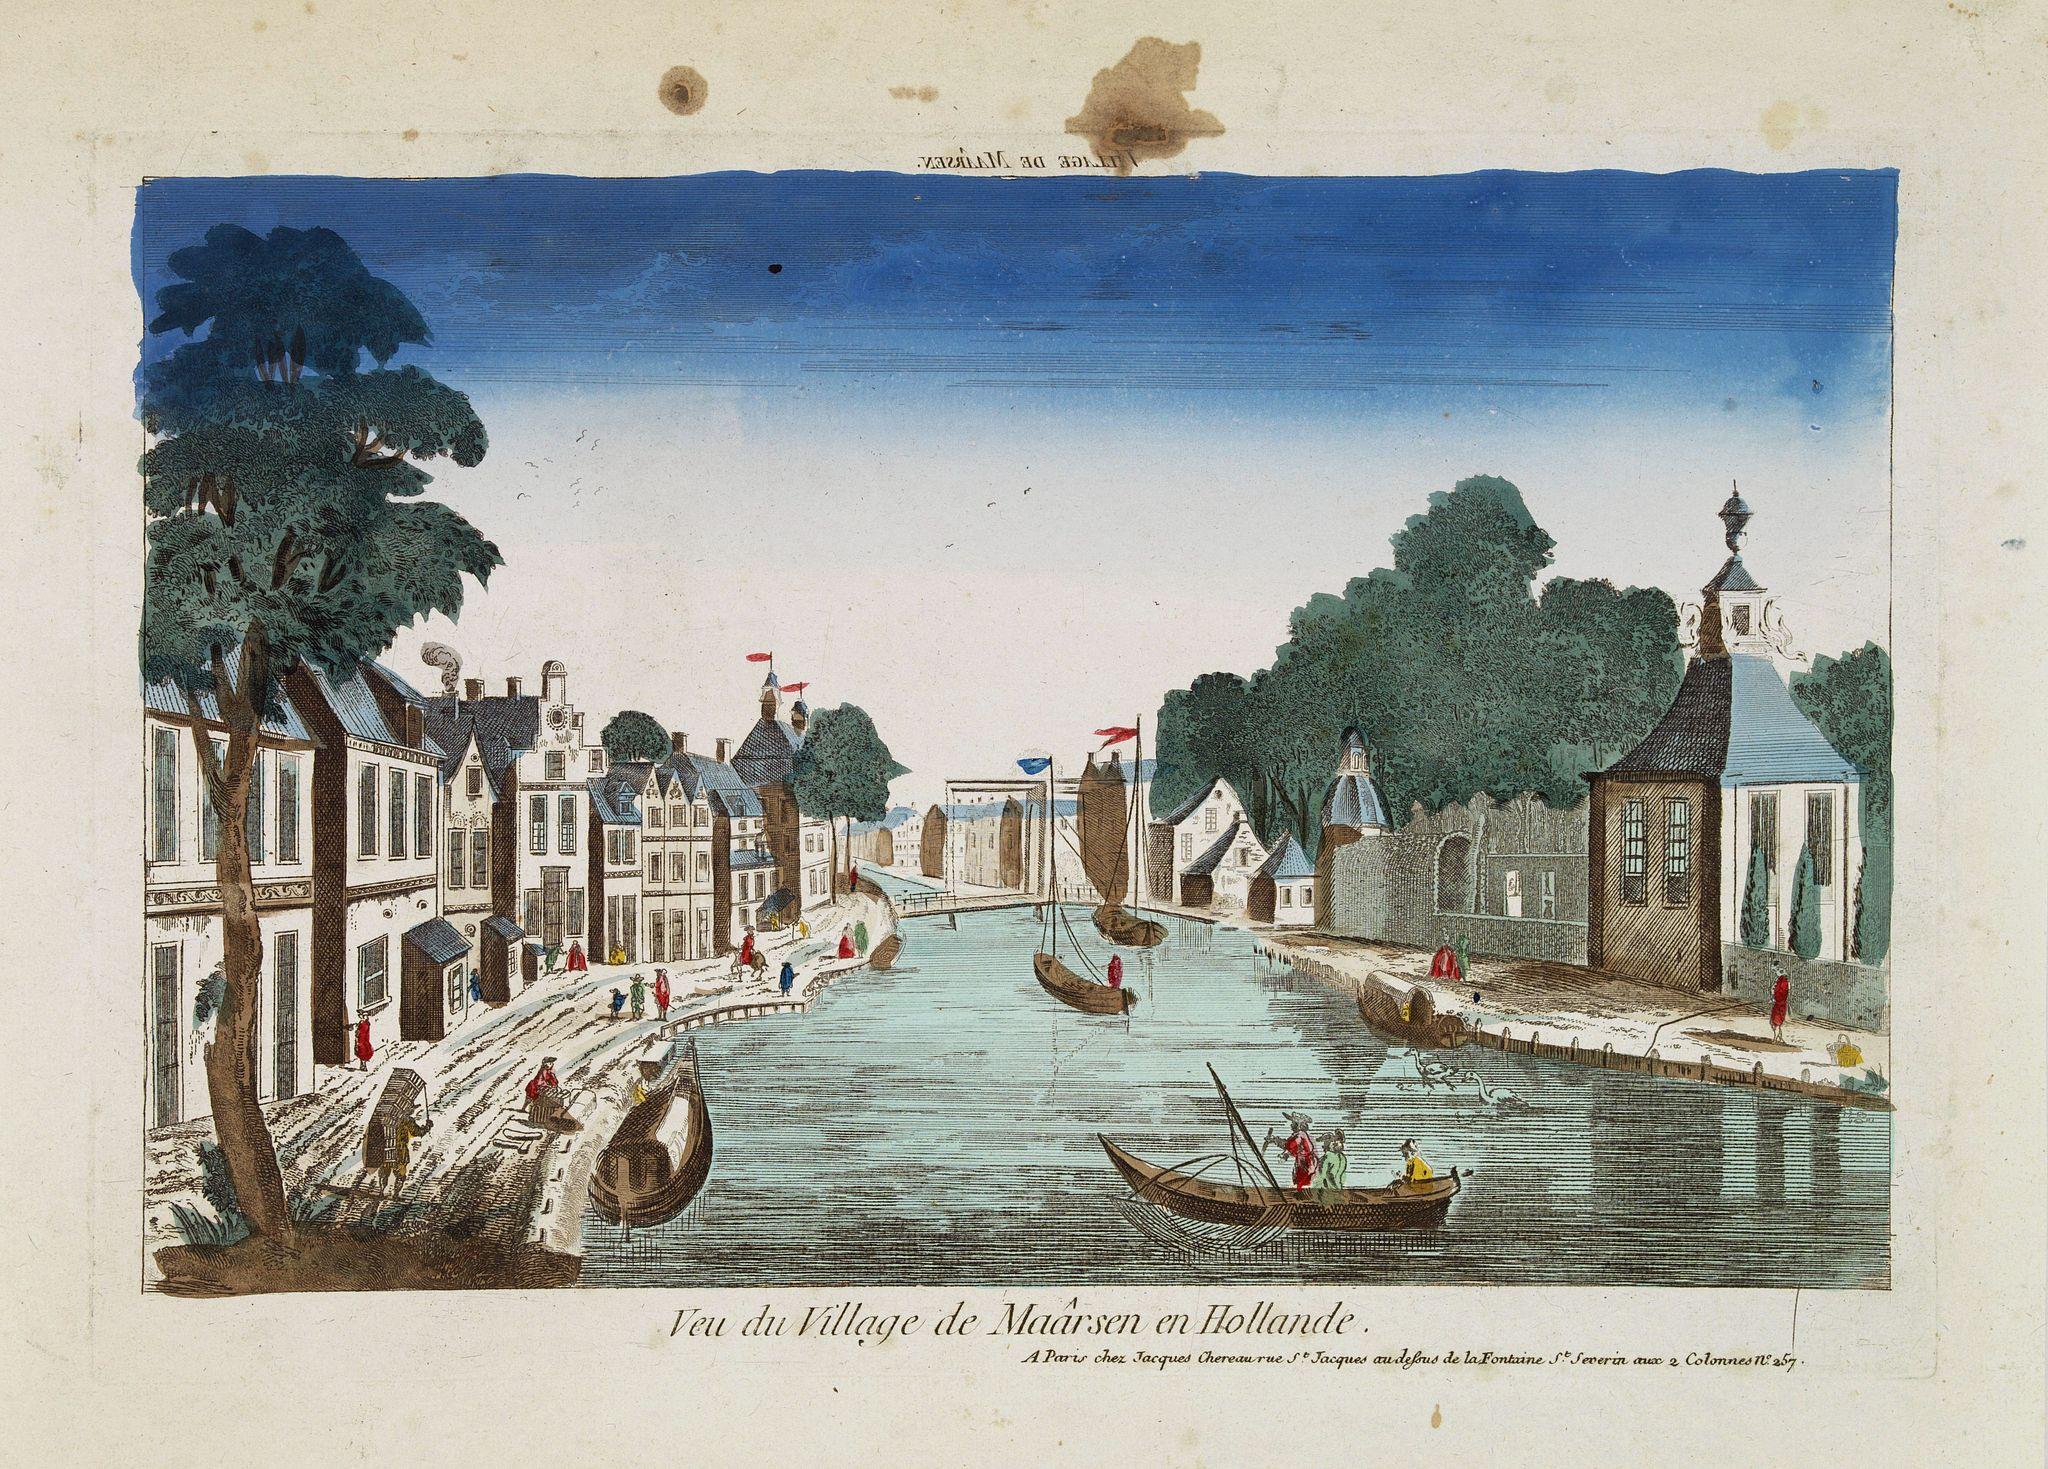 CHEREAU, J. -  Vue du village de Maarsen en Hollande.